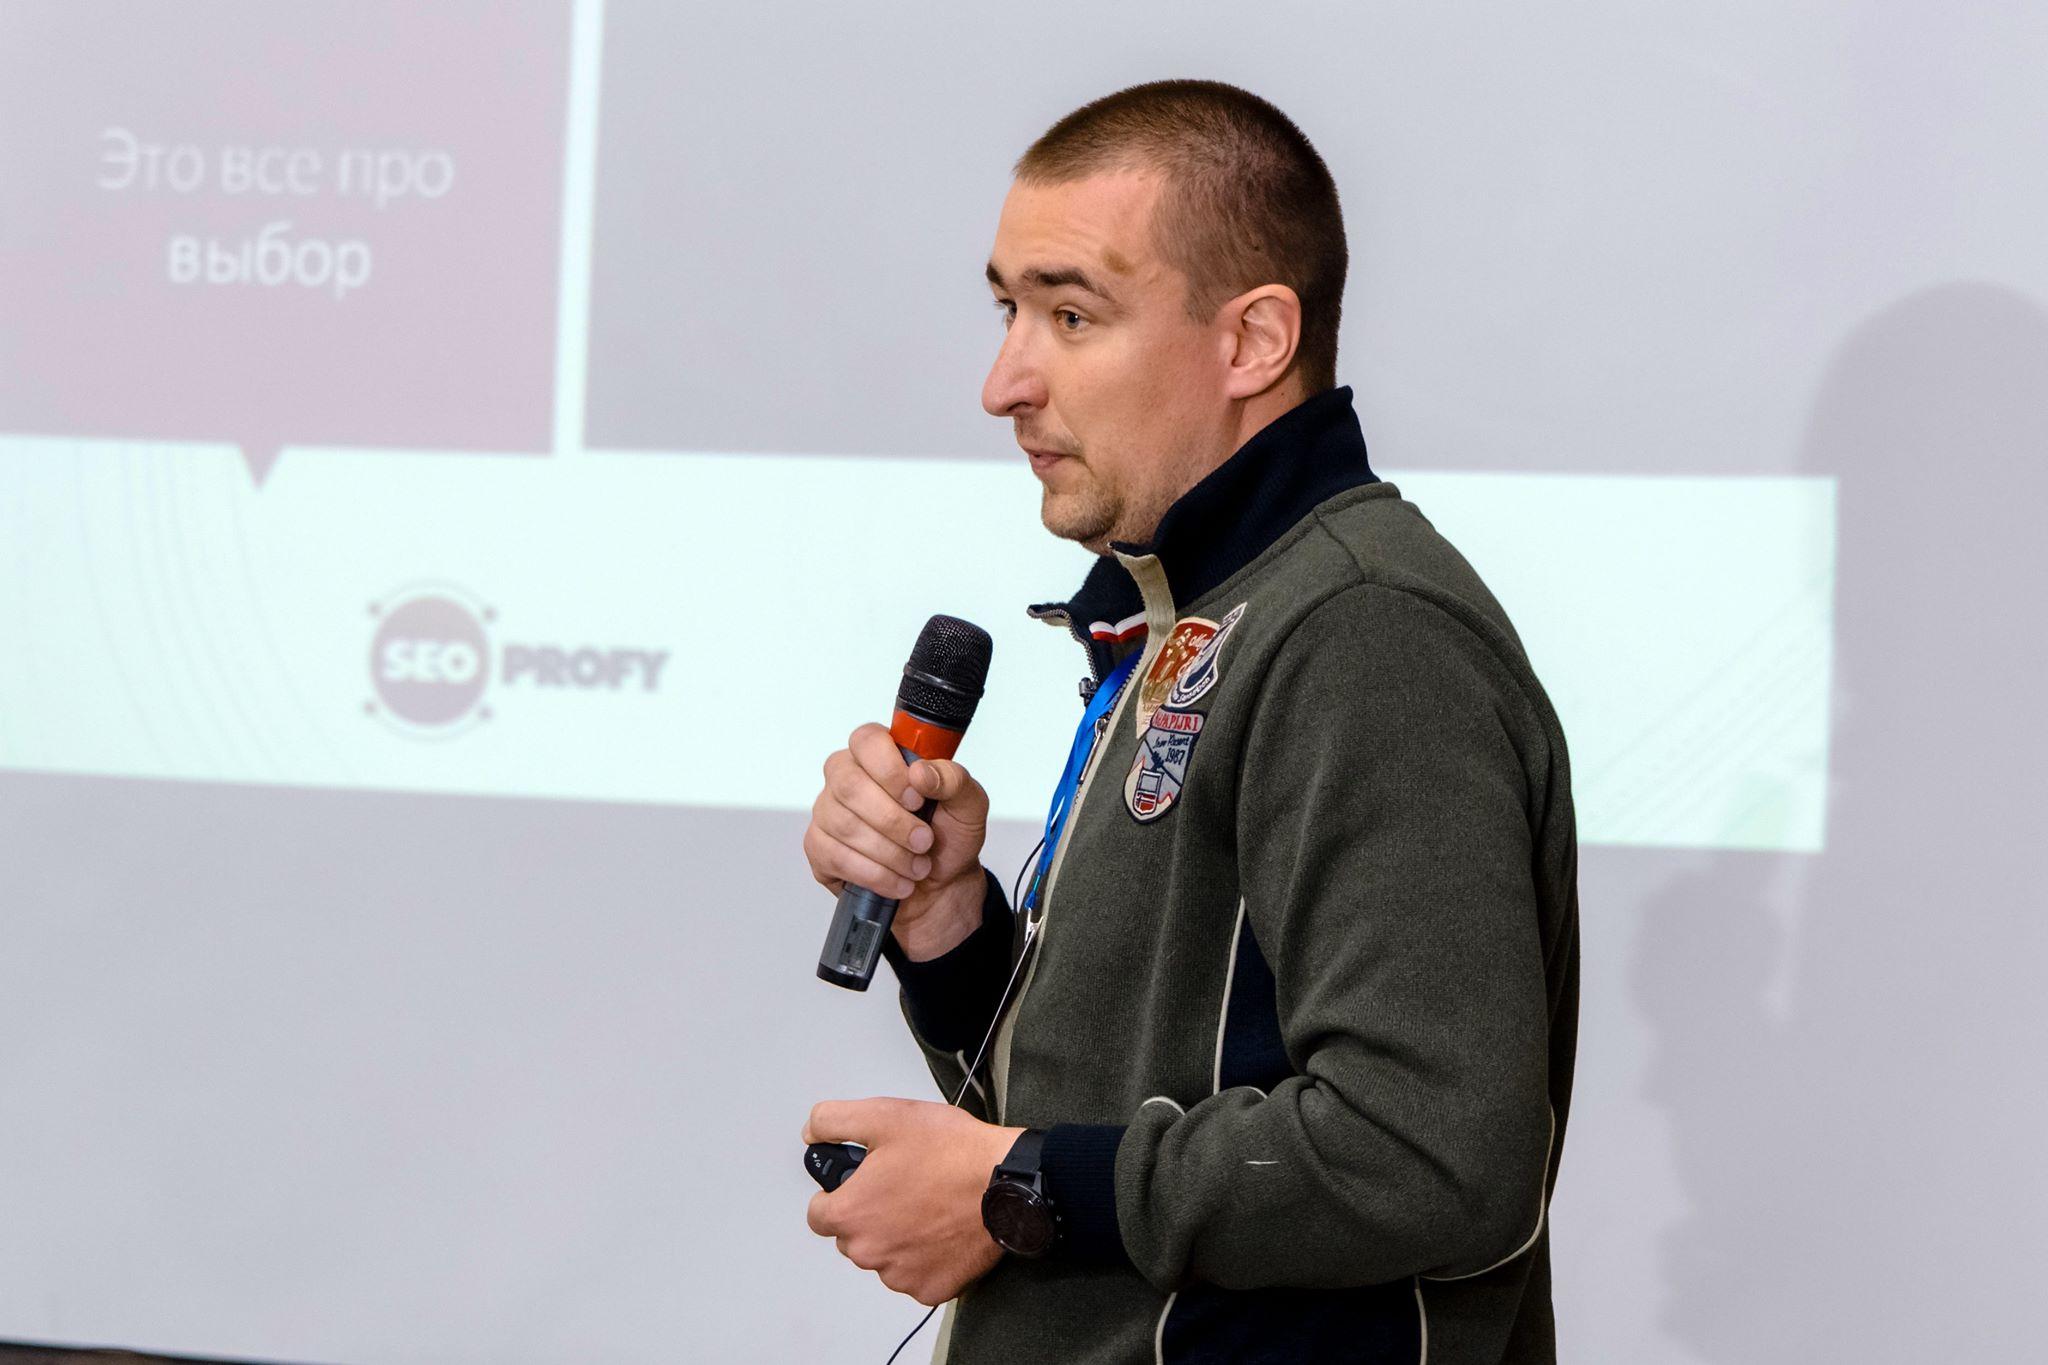 Доклад на конференции Guru Conf 2018